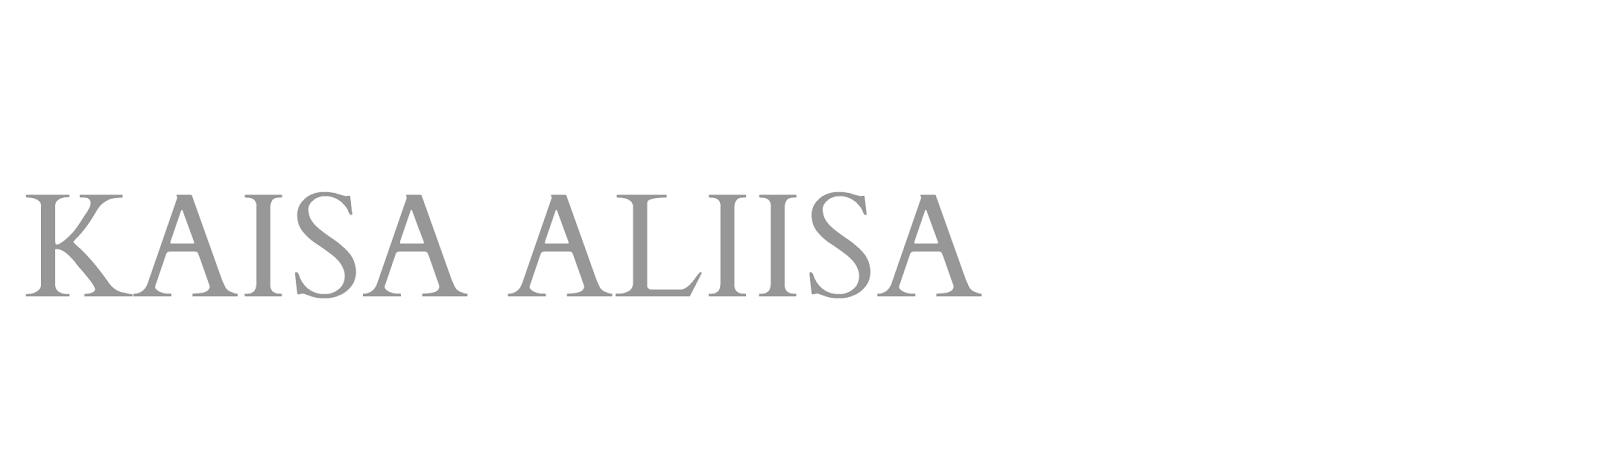 Kaisa Aliisa